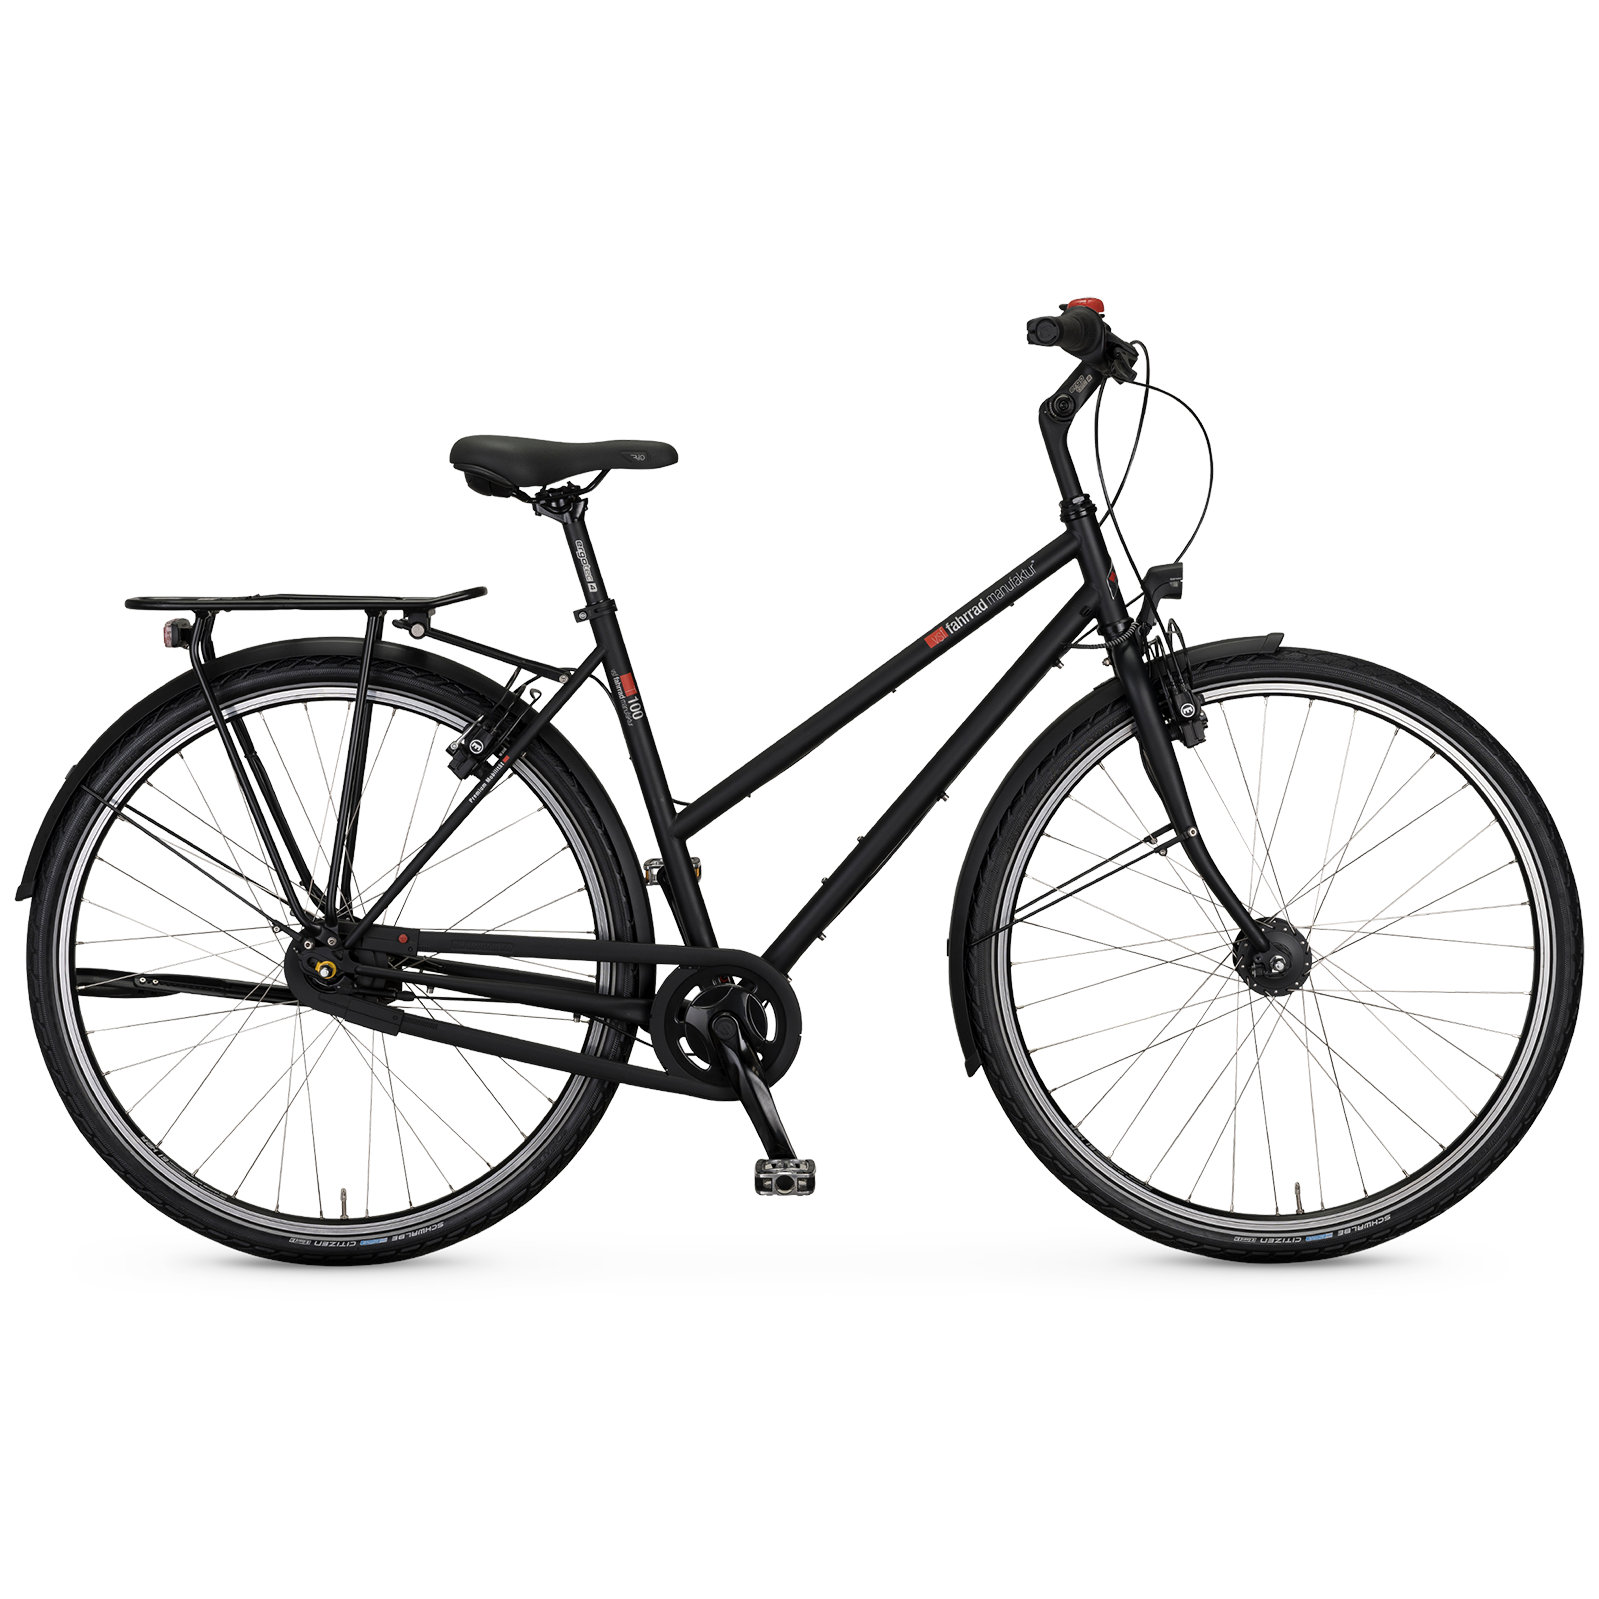 vsf fahrradmanufaktur T-100 HS11 Nexus - Women Trekking Bike - 2022 - ebony matte